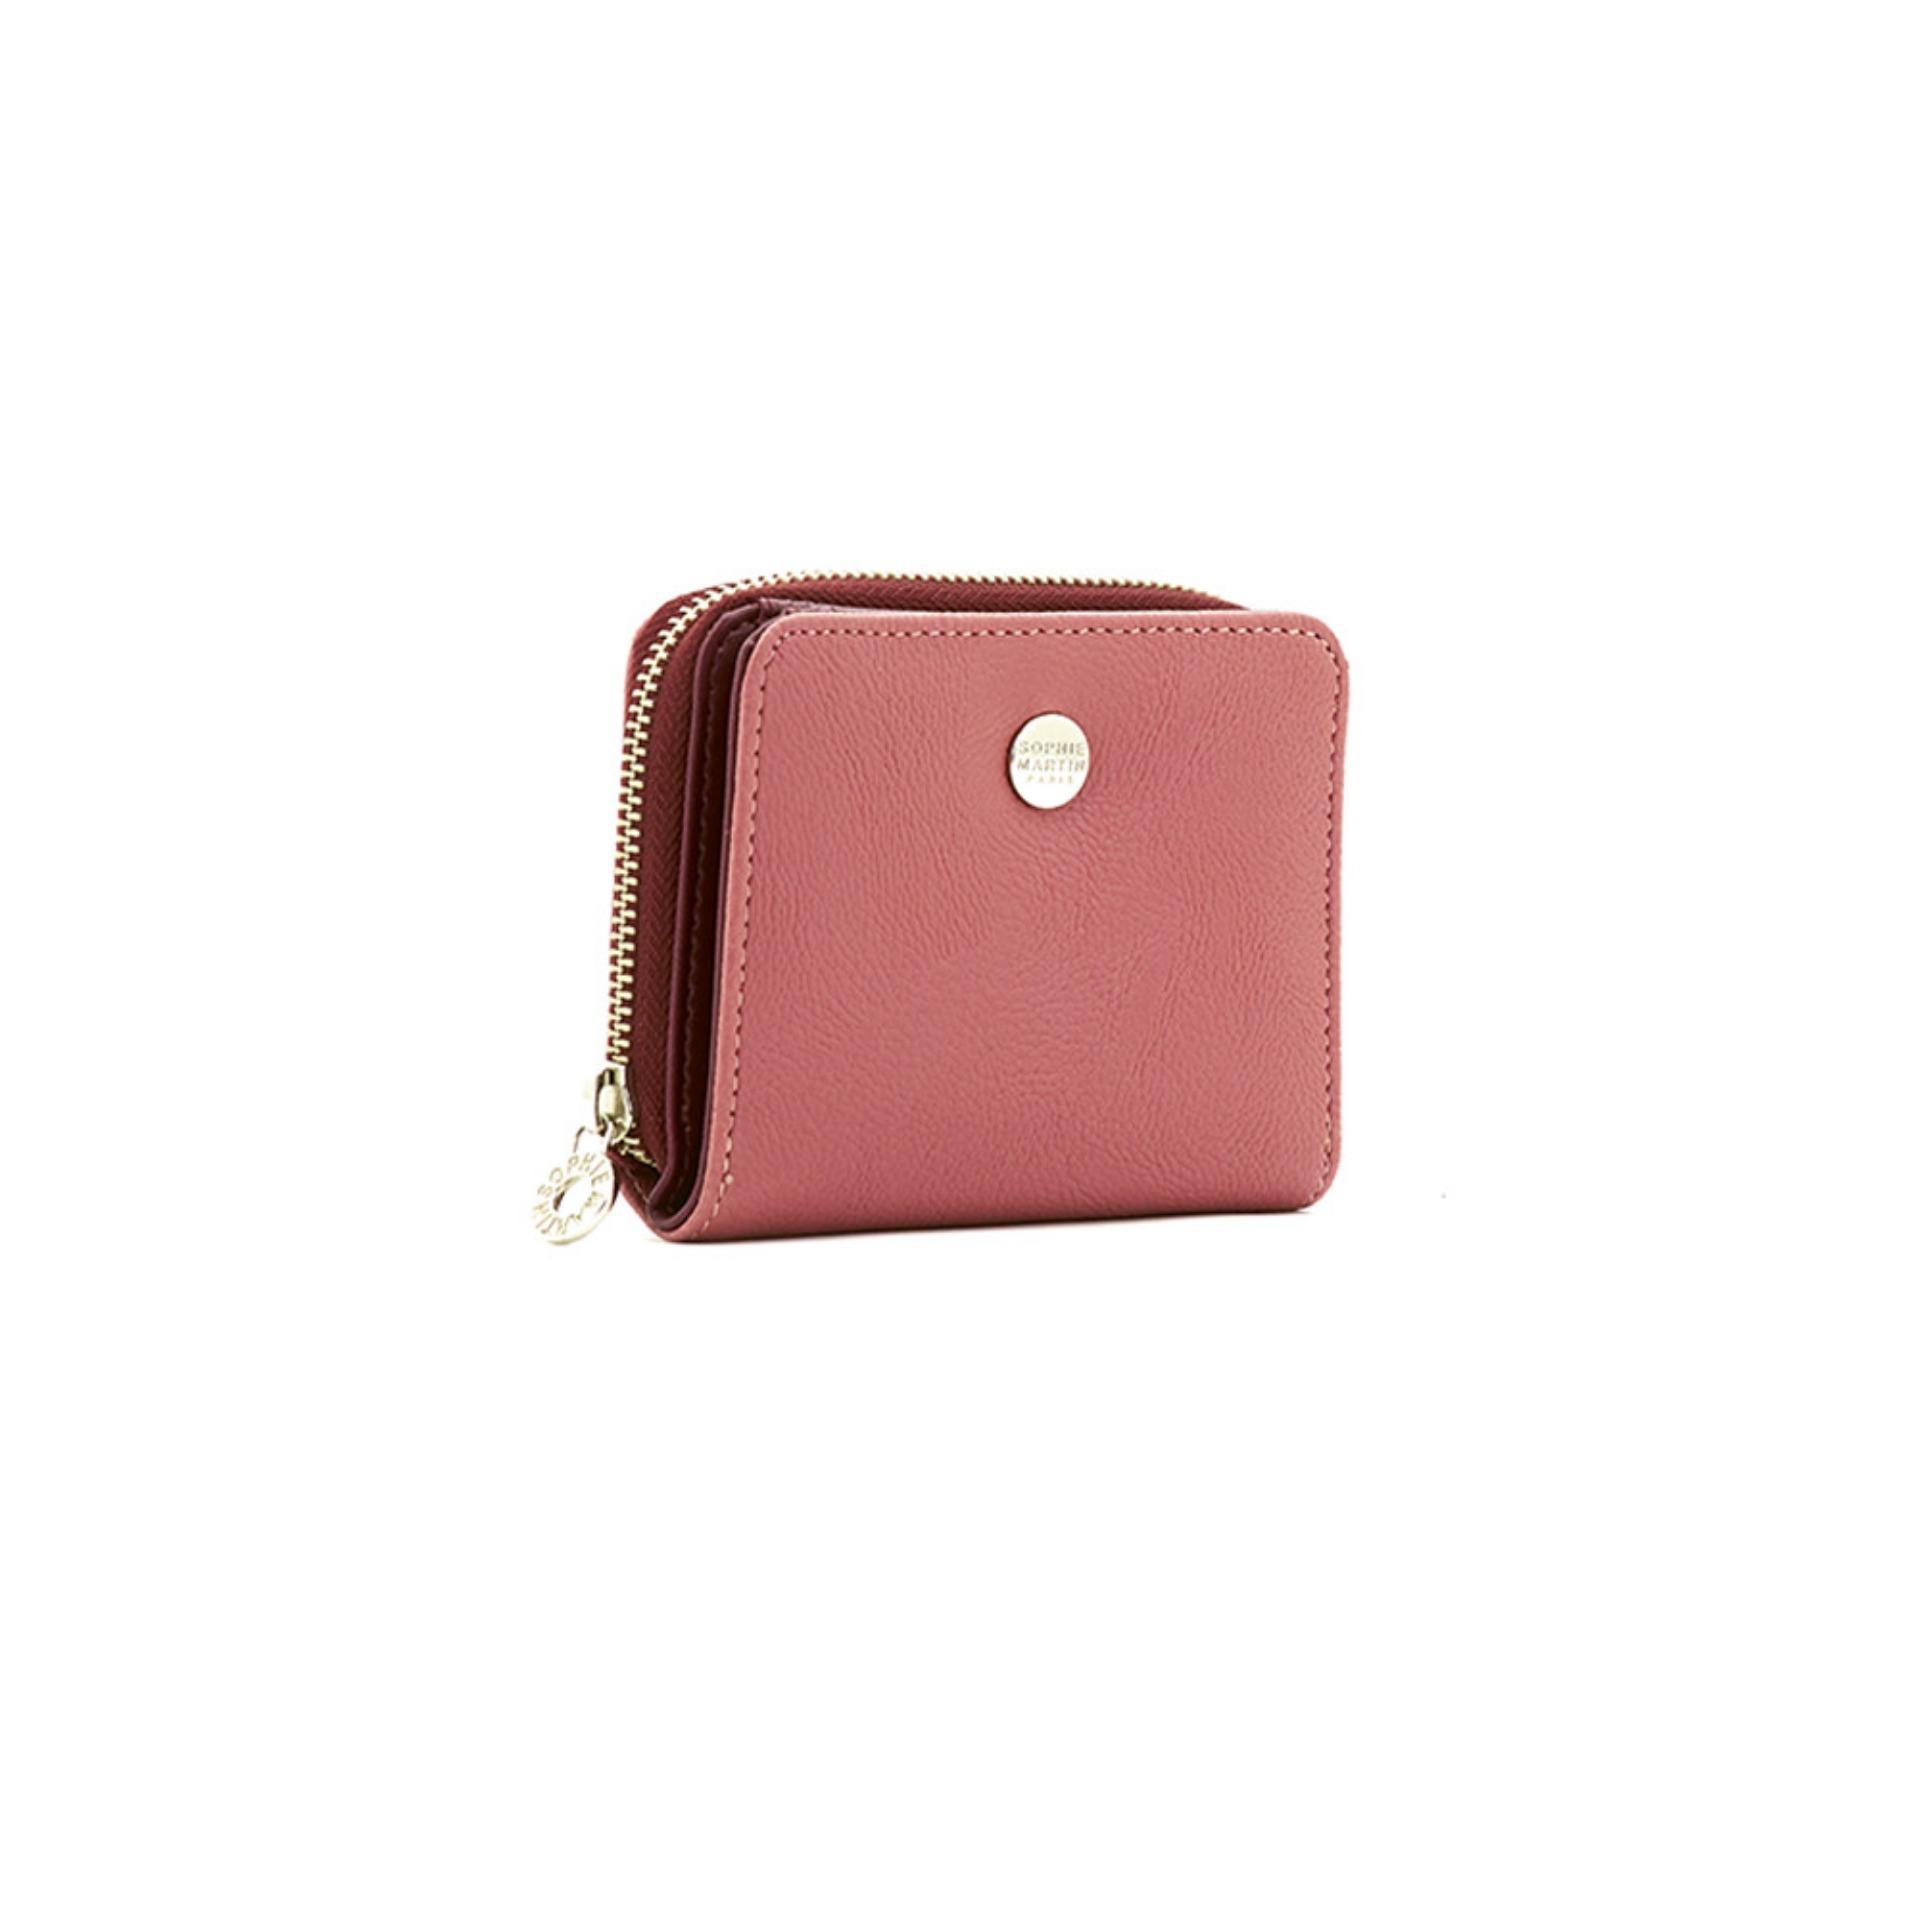 ... Sophie Paris Dompet Branded Wanita Terbaru Meya Wallet W1544D1 - Dusty  Pink - 4 a6cb42f041